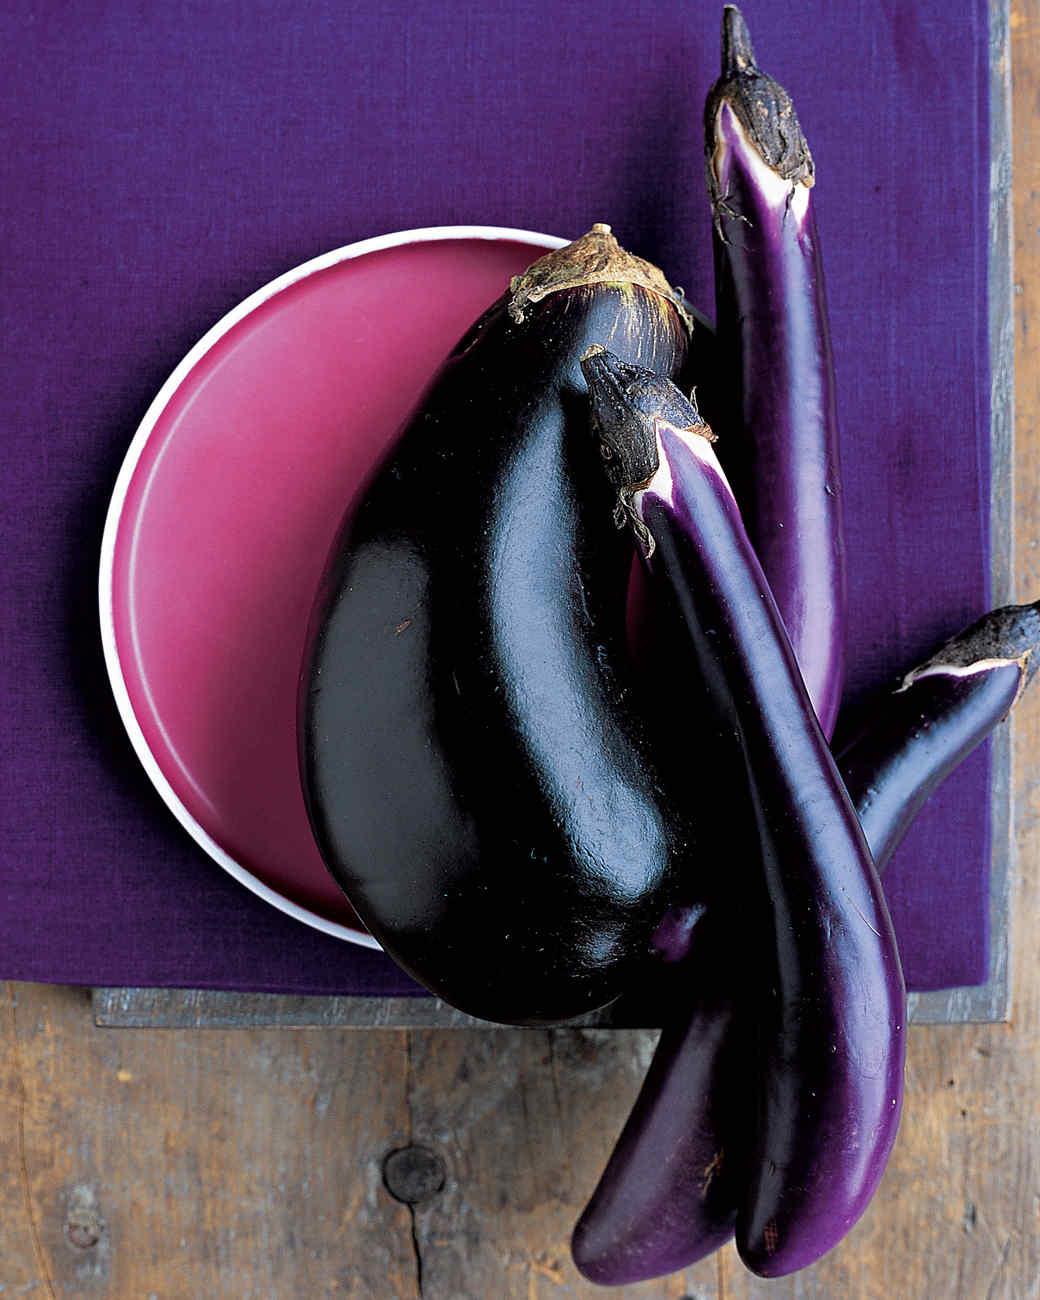 1040x1300 > Eggplant Wallpapers